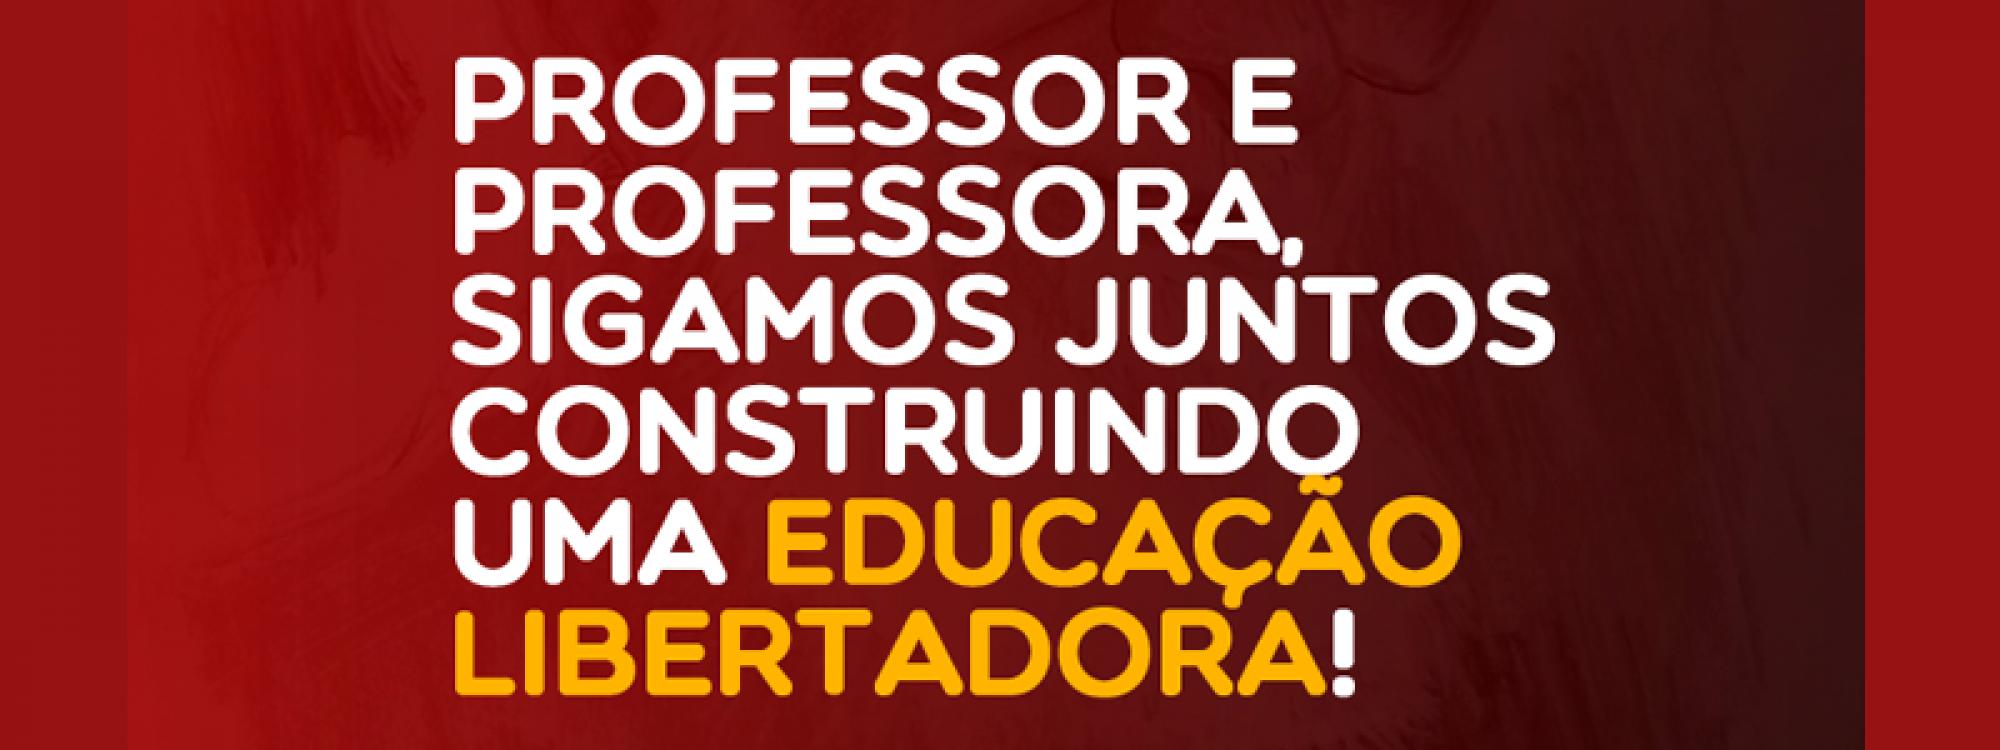 A ADUFU parabeniza e presenteia docentes filiados/as neste 15 de outubro